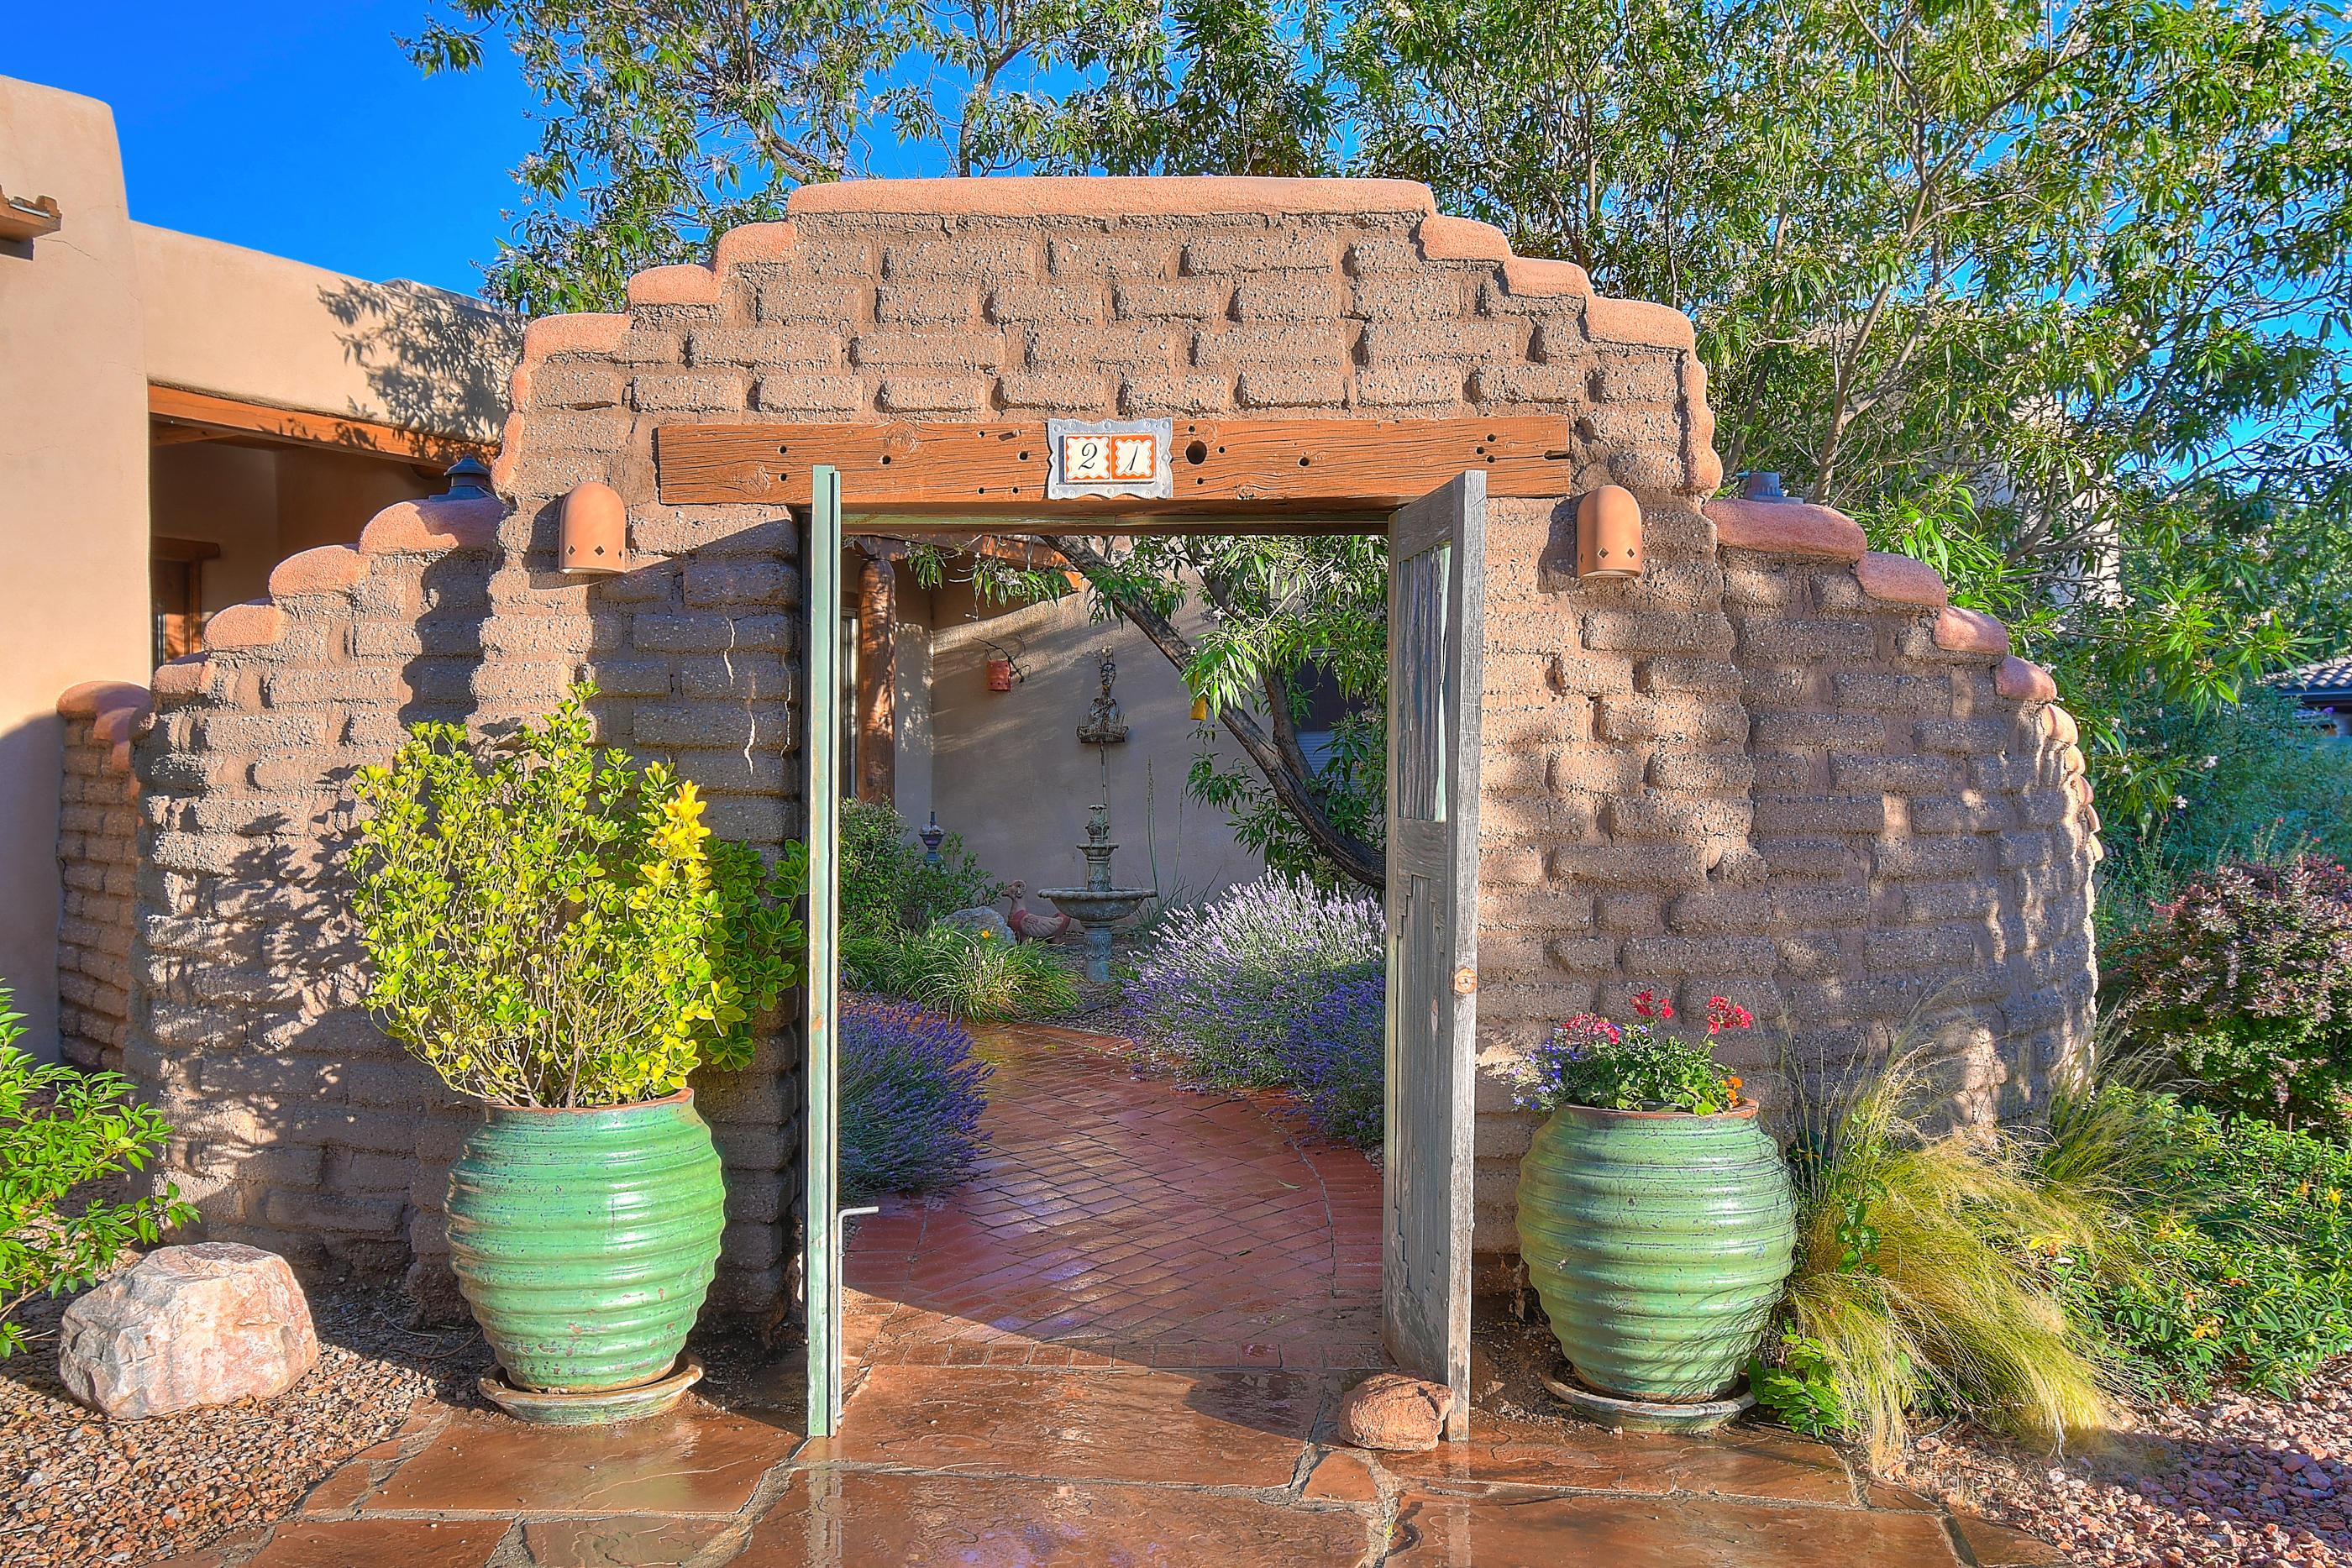 21 Manzano Road, Corrales, NM 87048 - Corrales, NM real estate listing